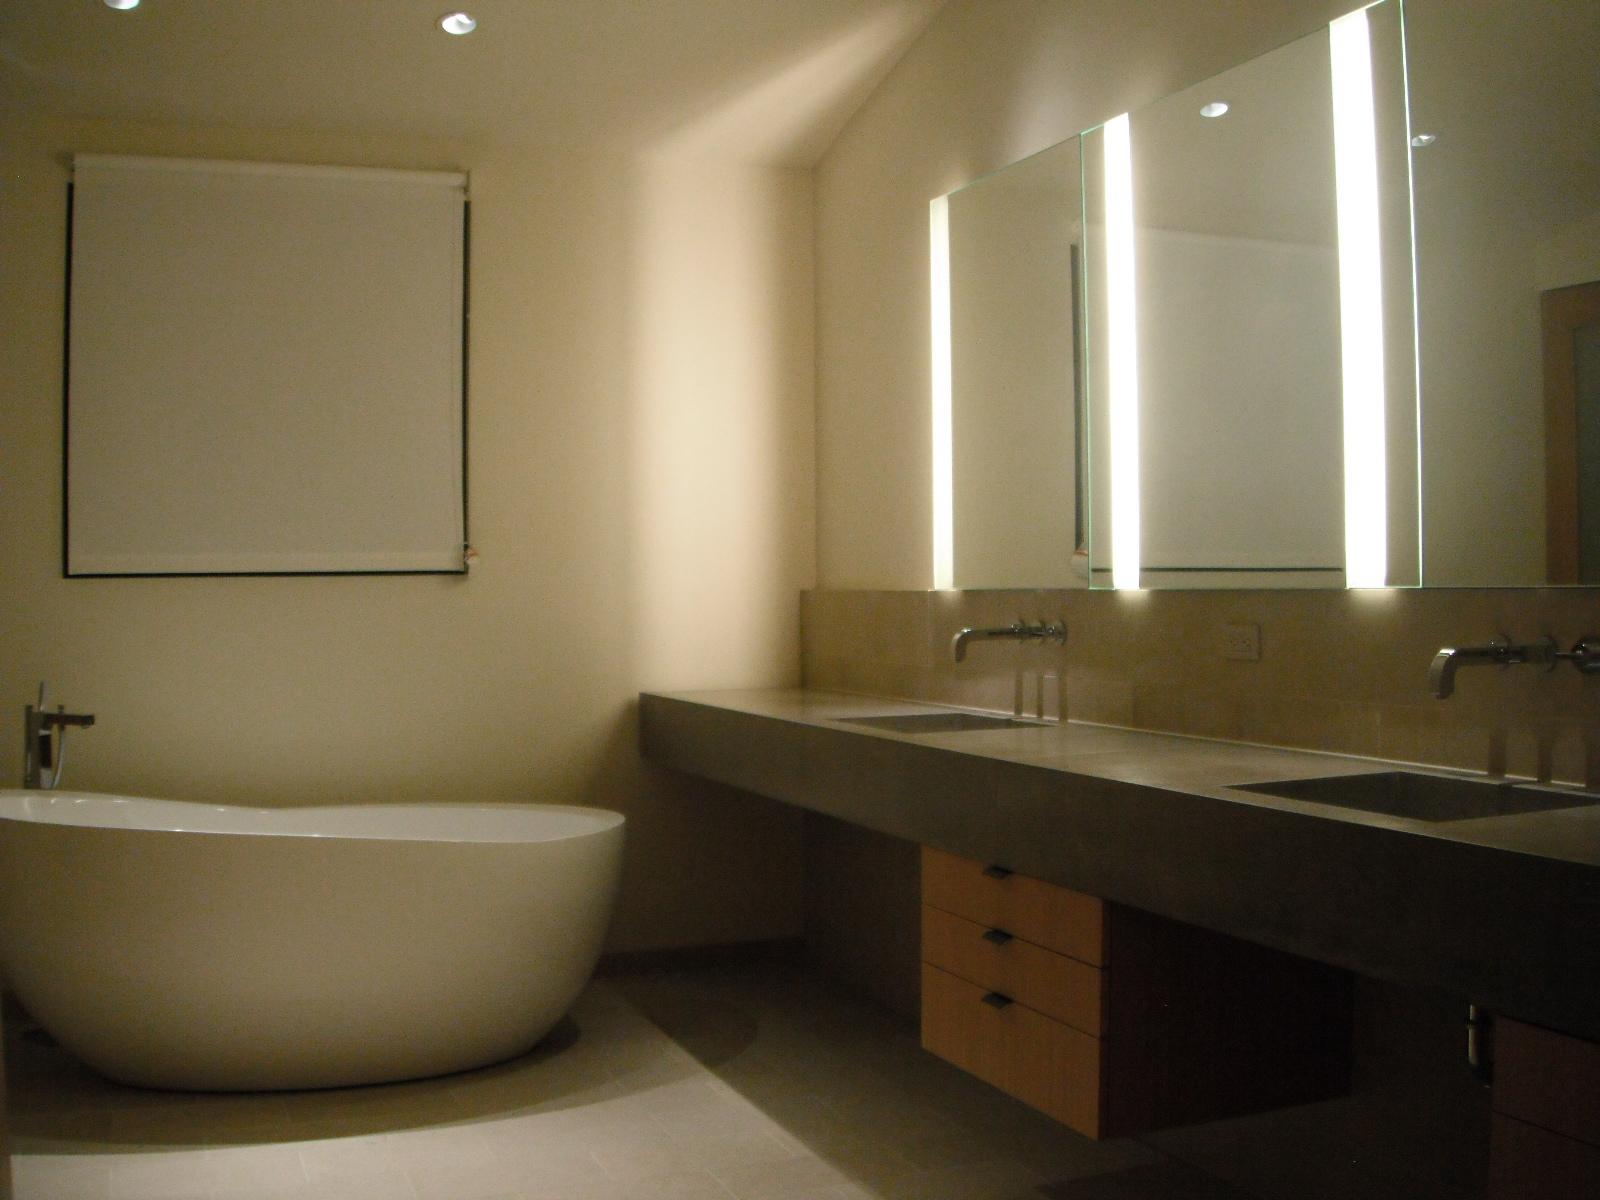 bathroom remodeling, concrete sinks